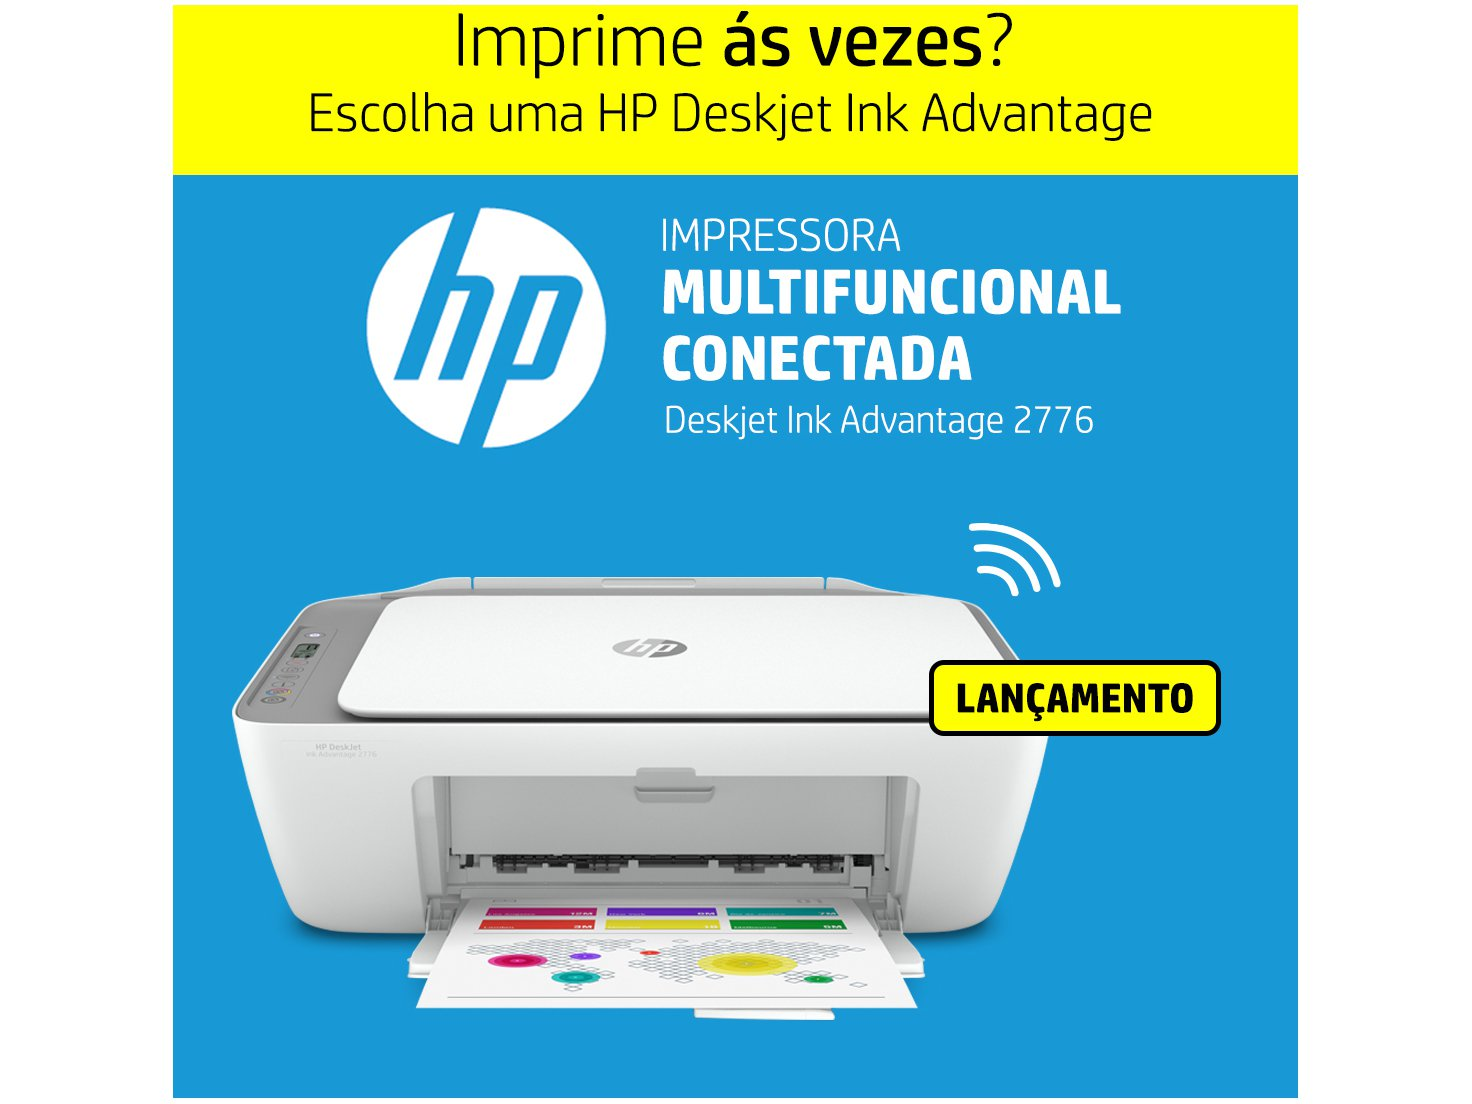 Impressora Multifuncional HP DeskJet Ink Advantage - 2776 Jato de Tinta Colorida Wi-Fi USB - Bivolt - 2